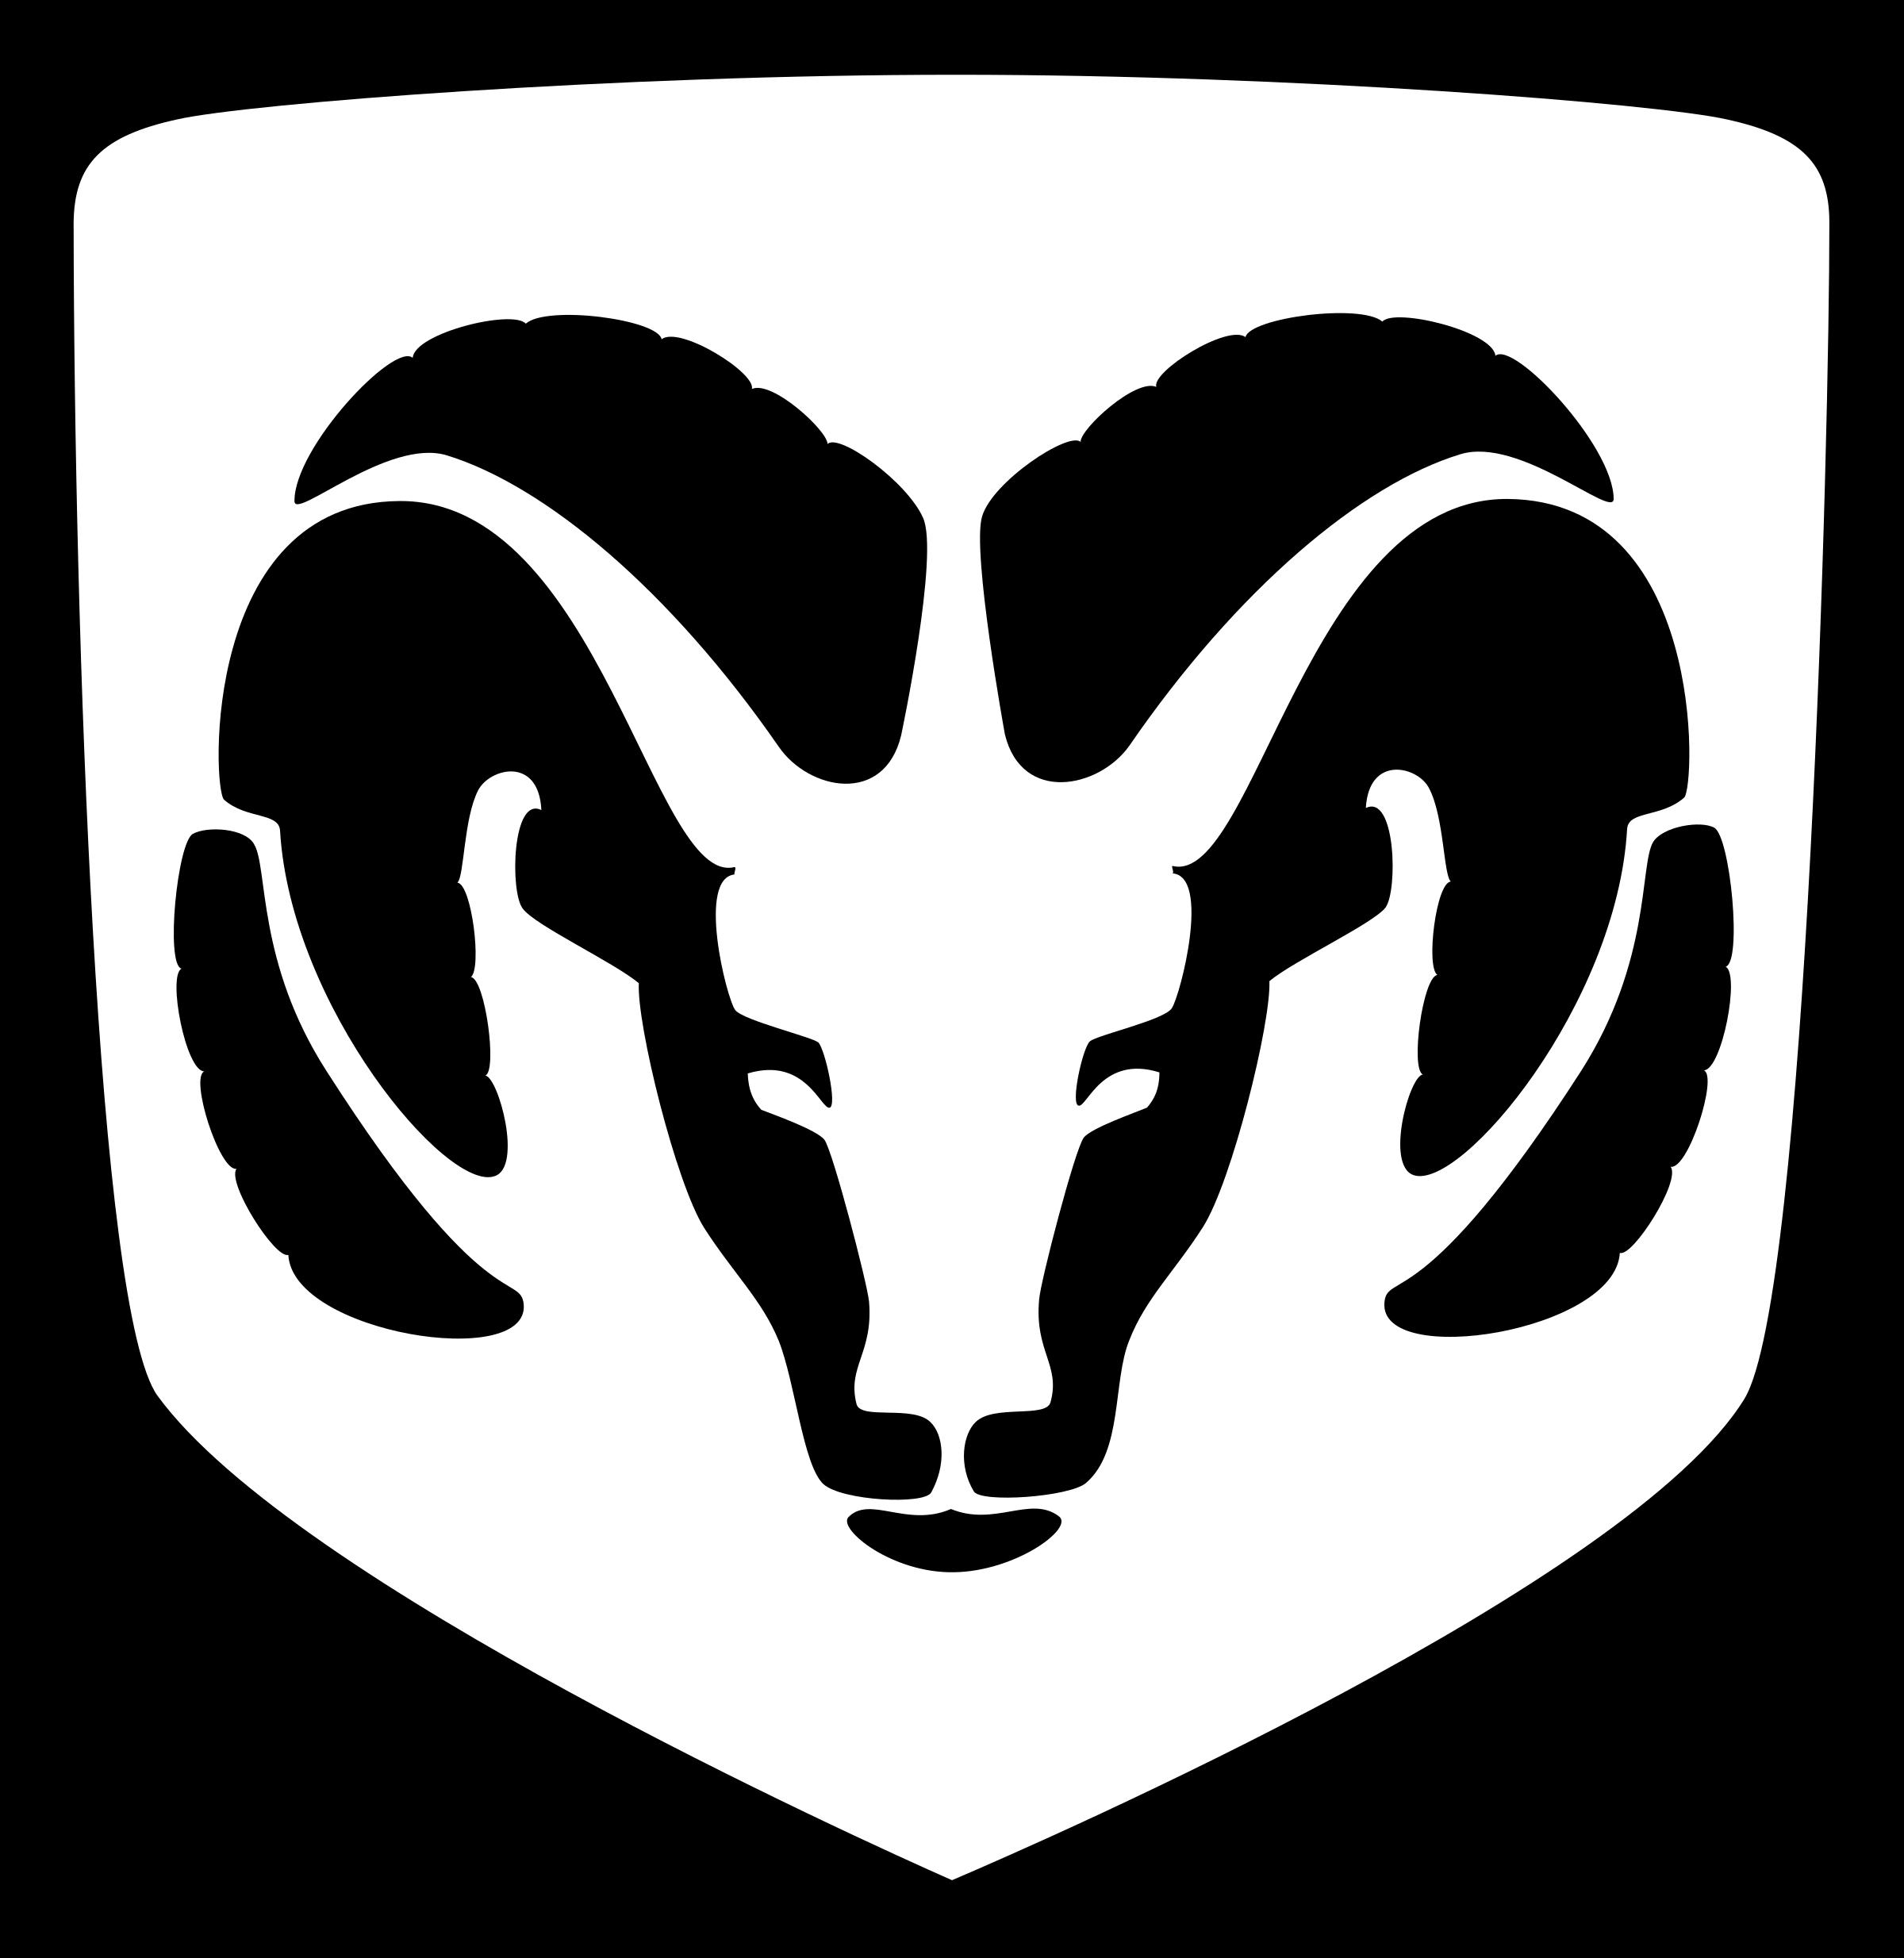 dodge-ram-logo-png-transparent.png